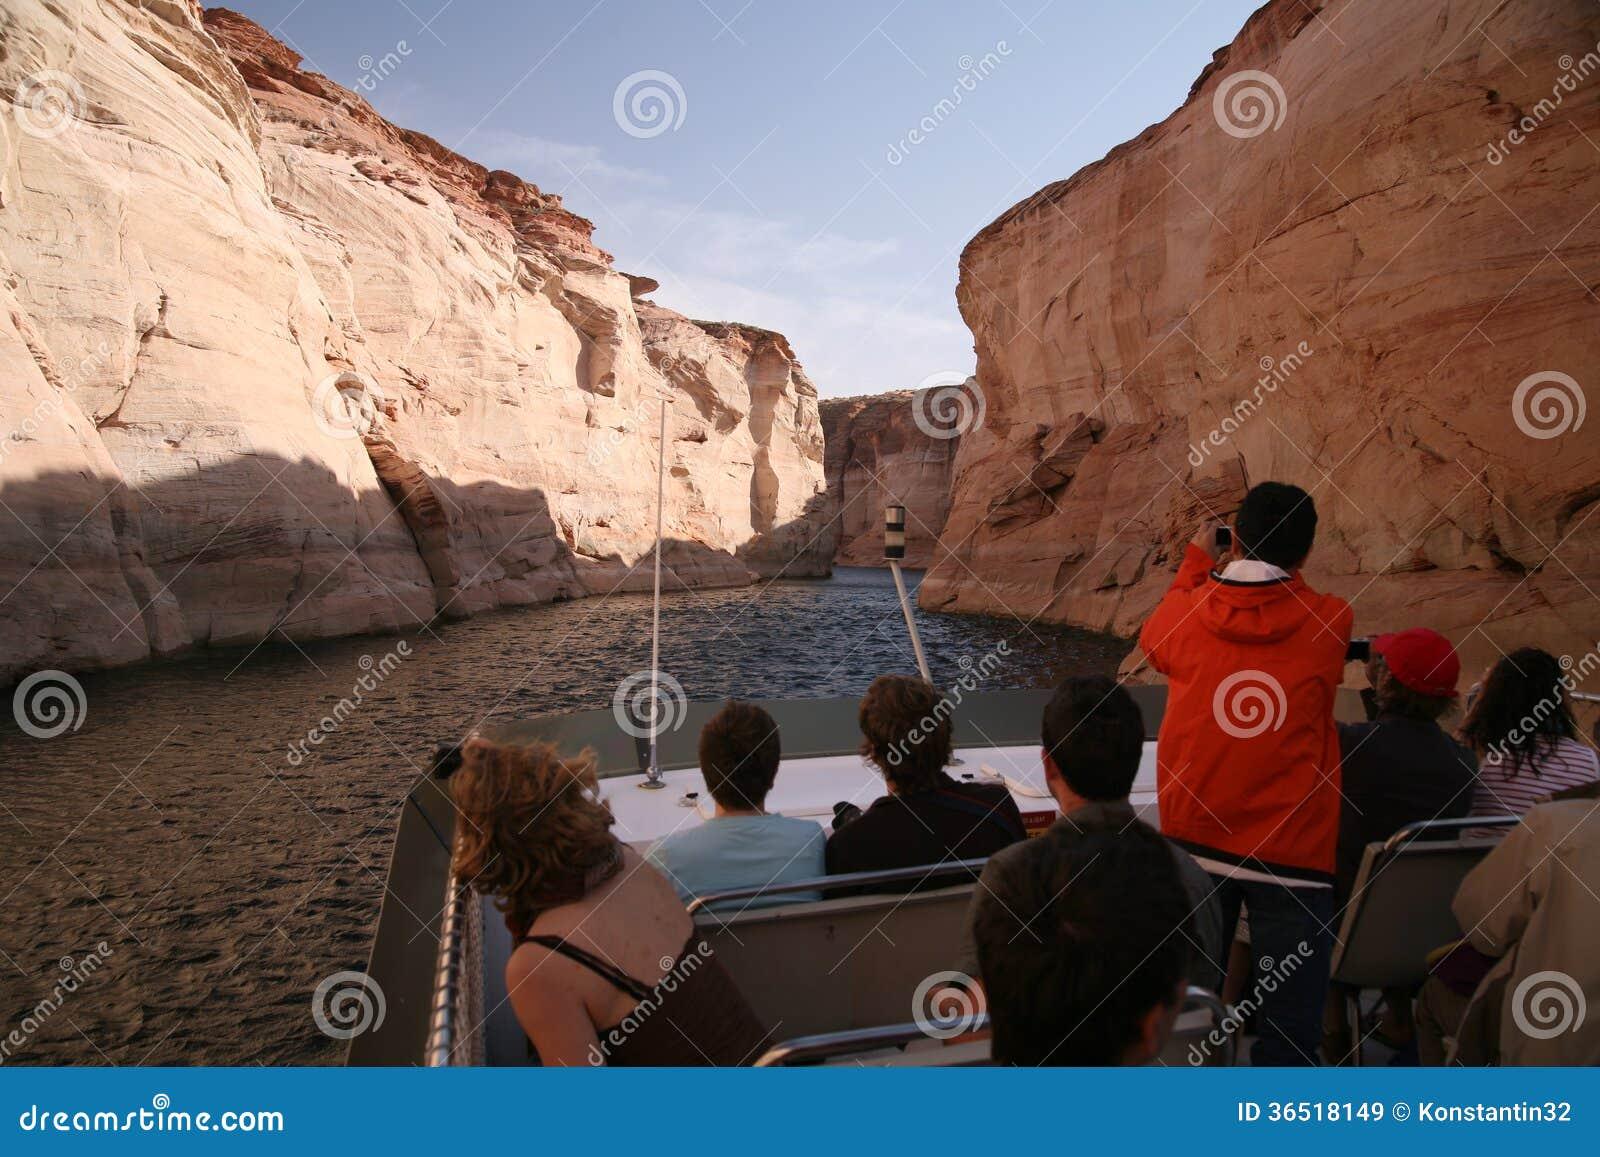 Glen Canyon, lac Powell, Arizona, Etats-Unis